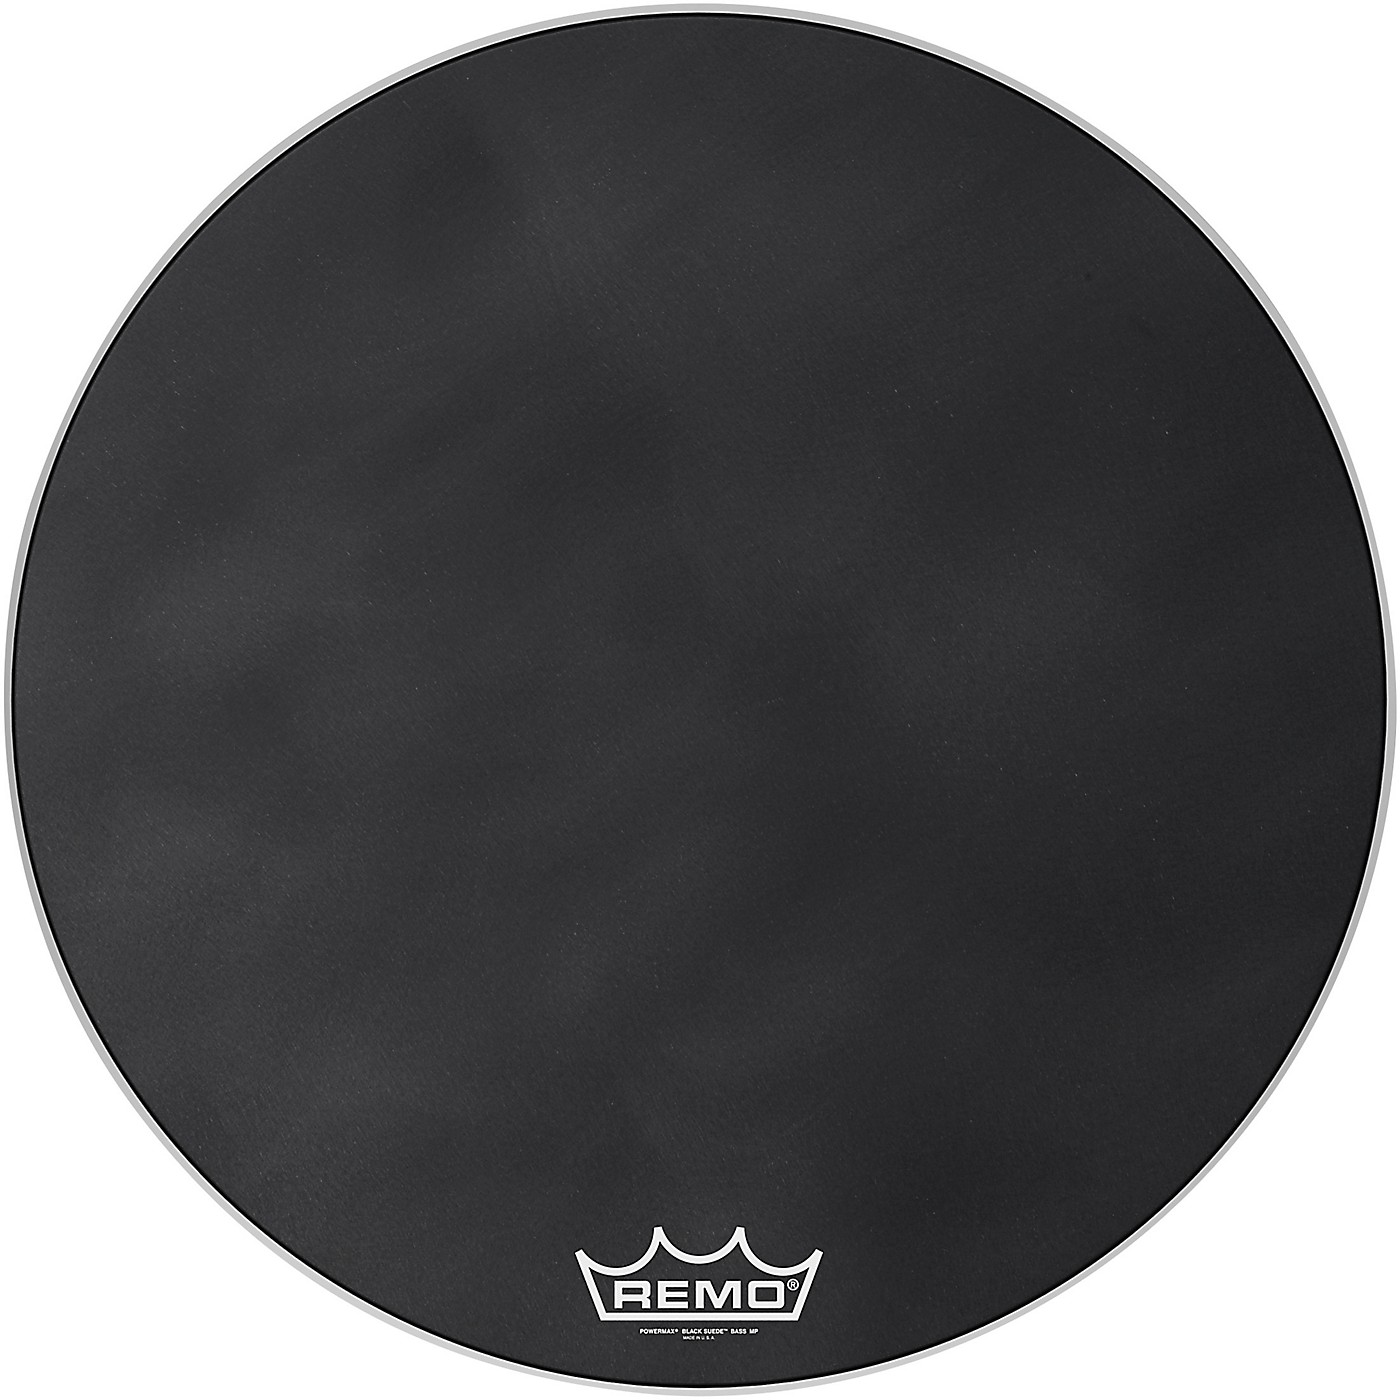 Remo Powermax Black Suede Crimplock Bass Drum Head thumbnail